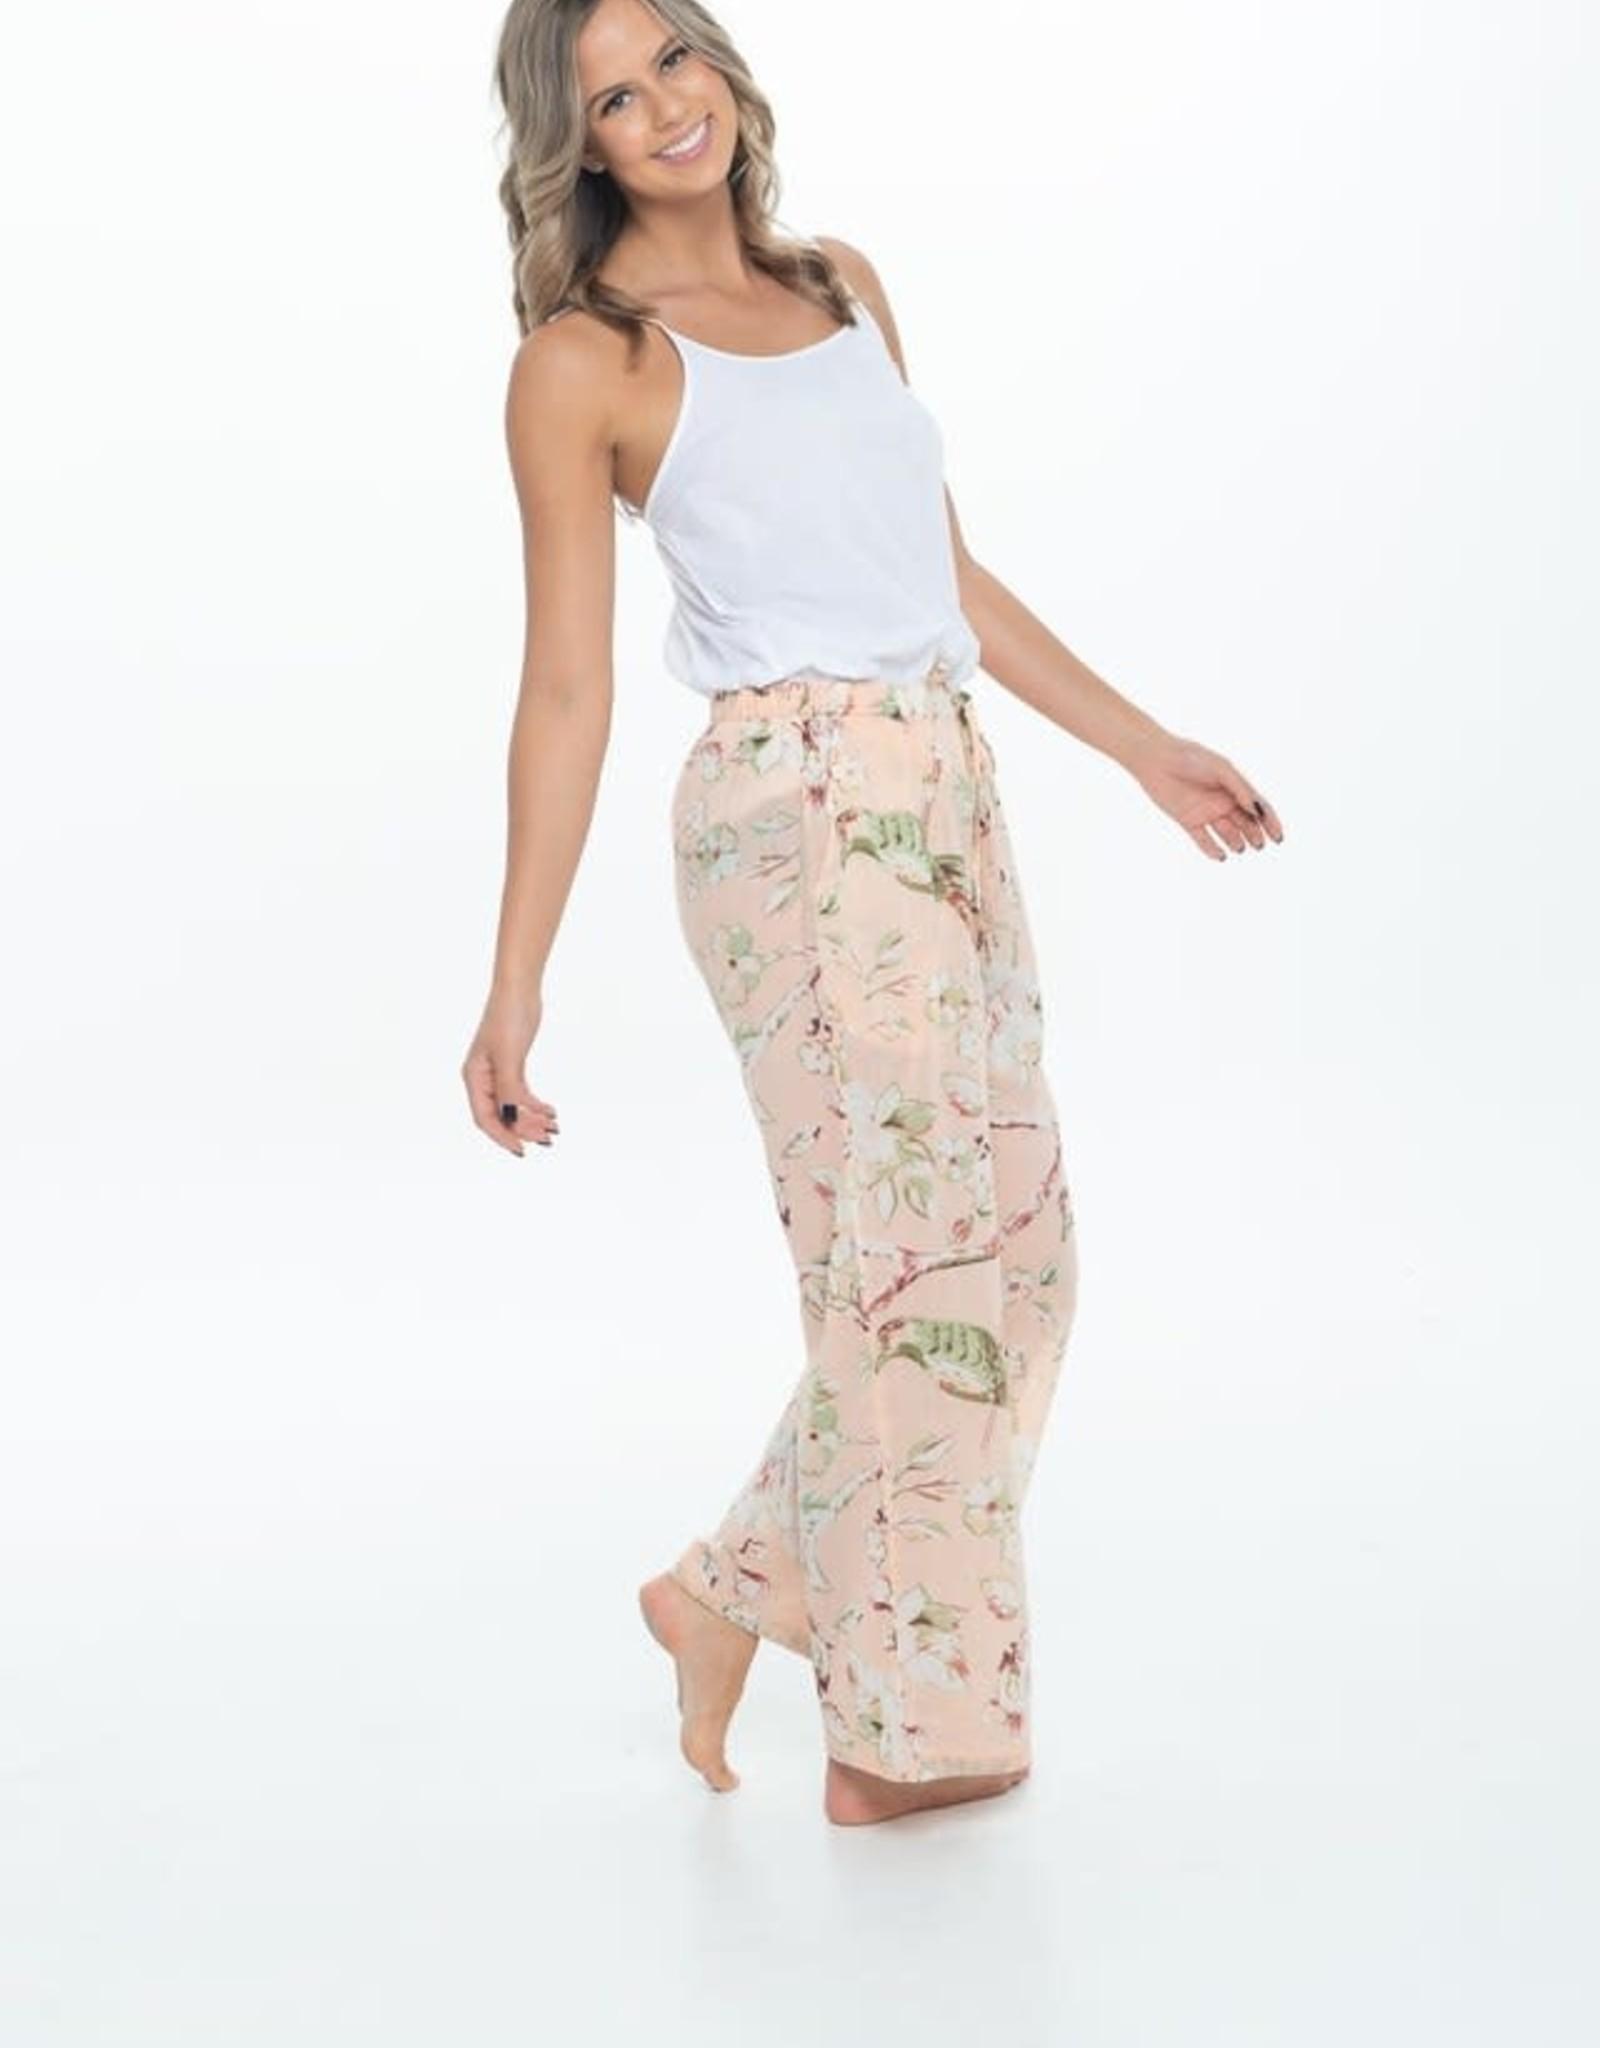 Linens Unlimited CLP211 BLOSSOM LOUNGE PANTS